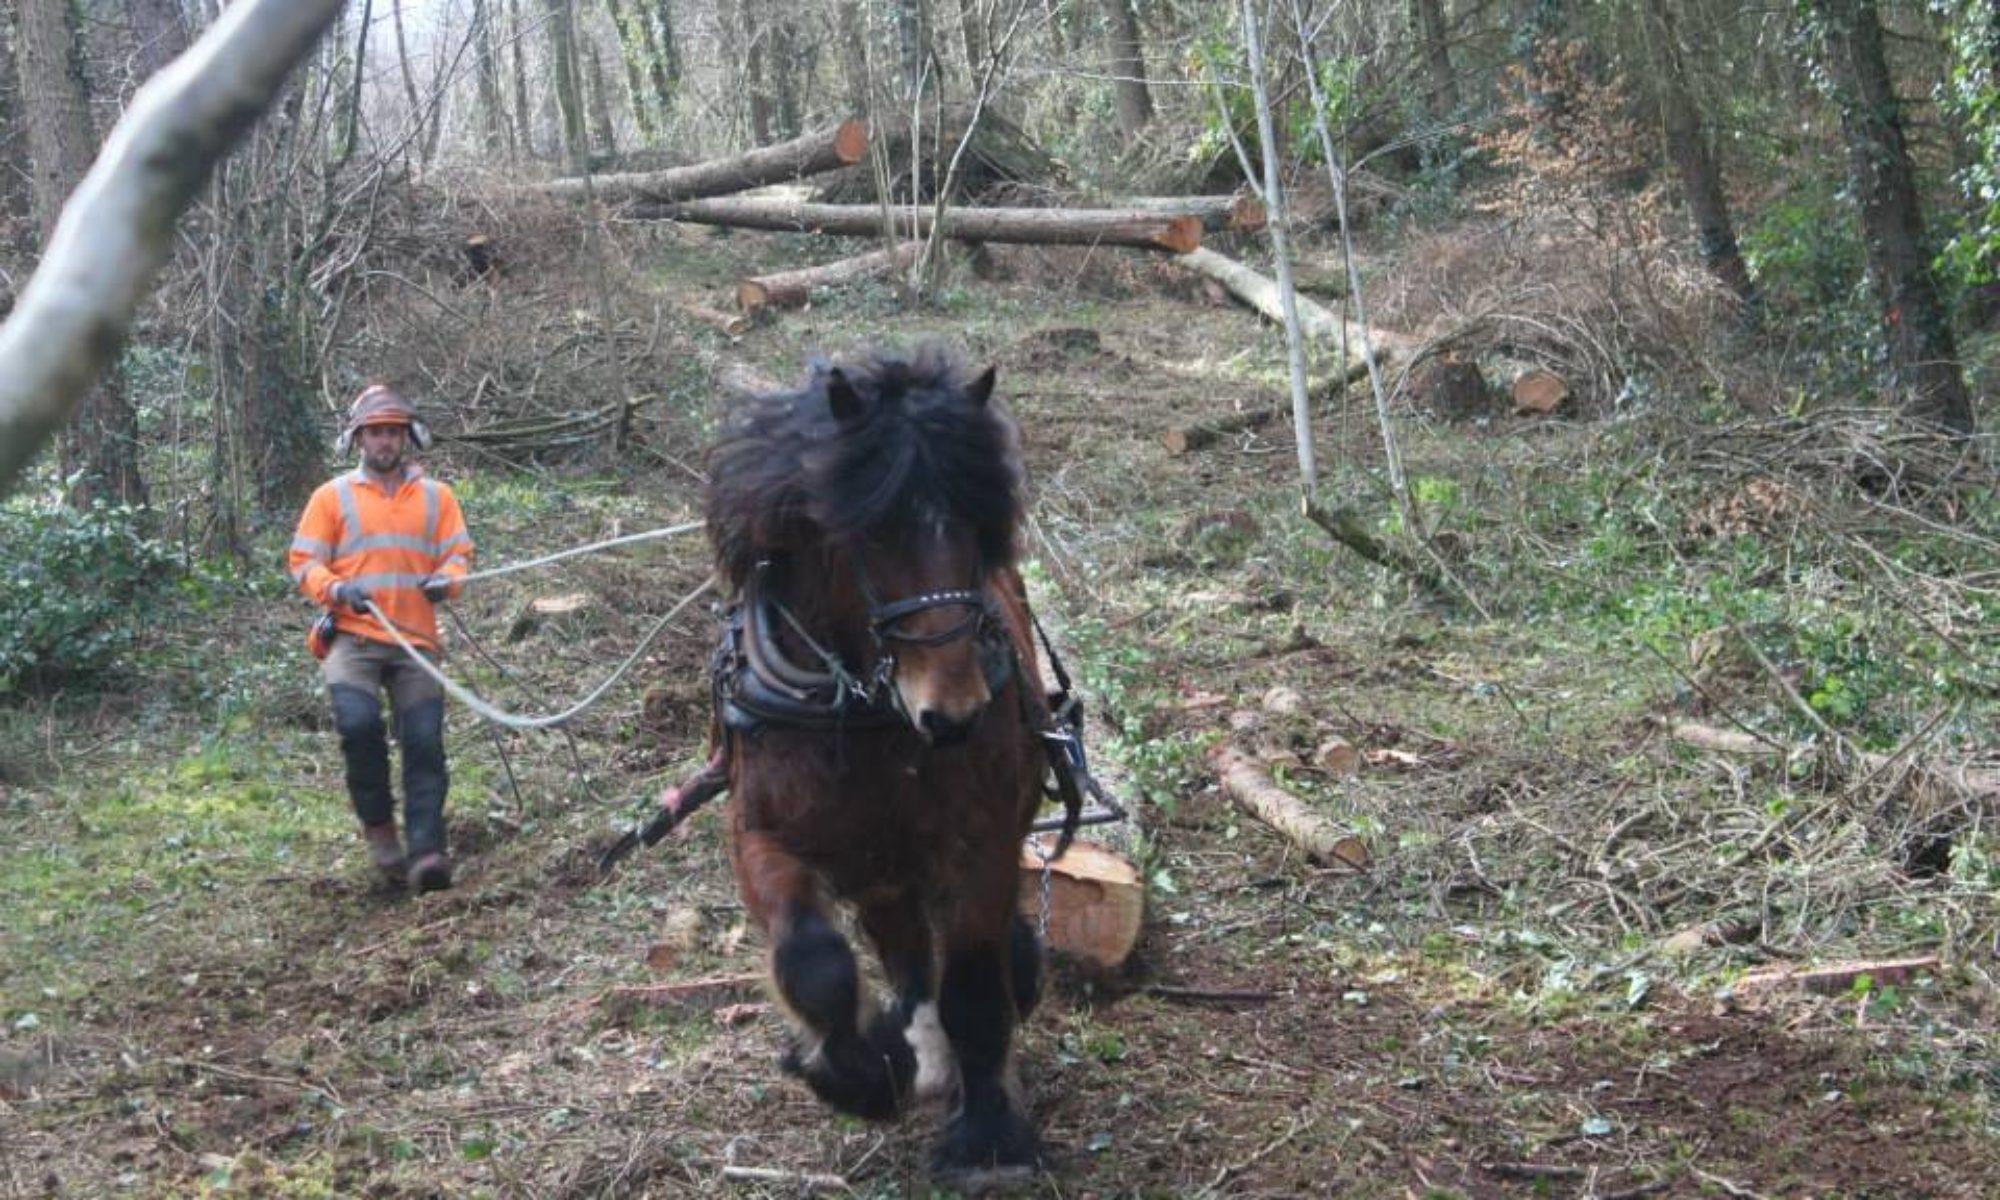 Dartmoor horse loggers